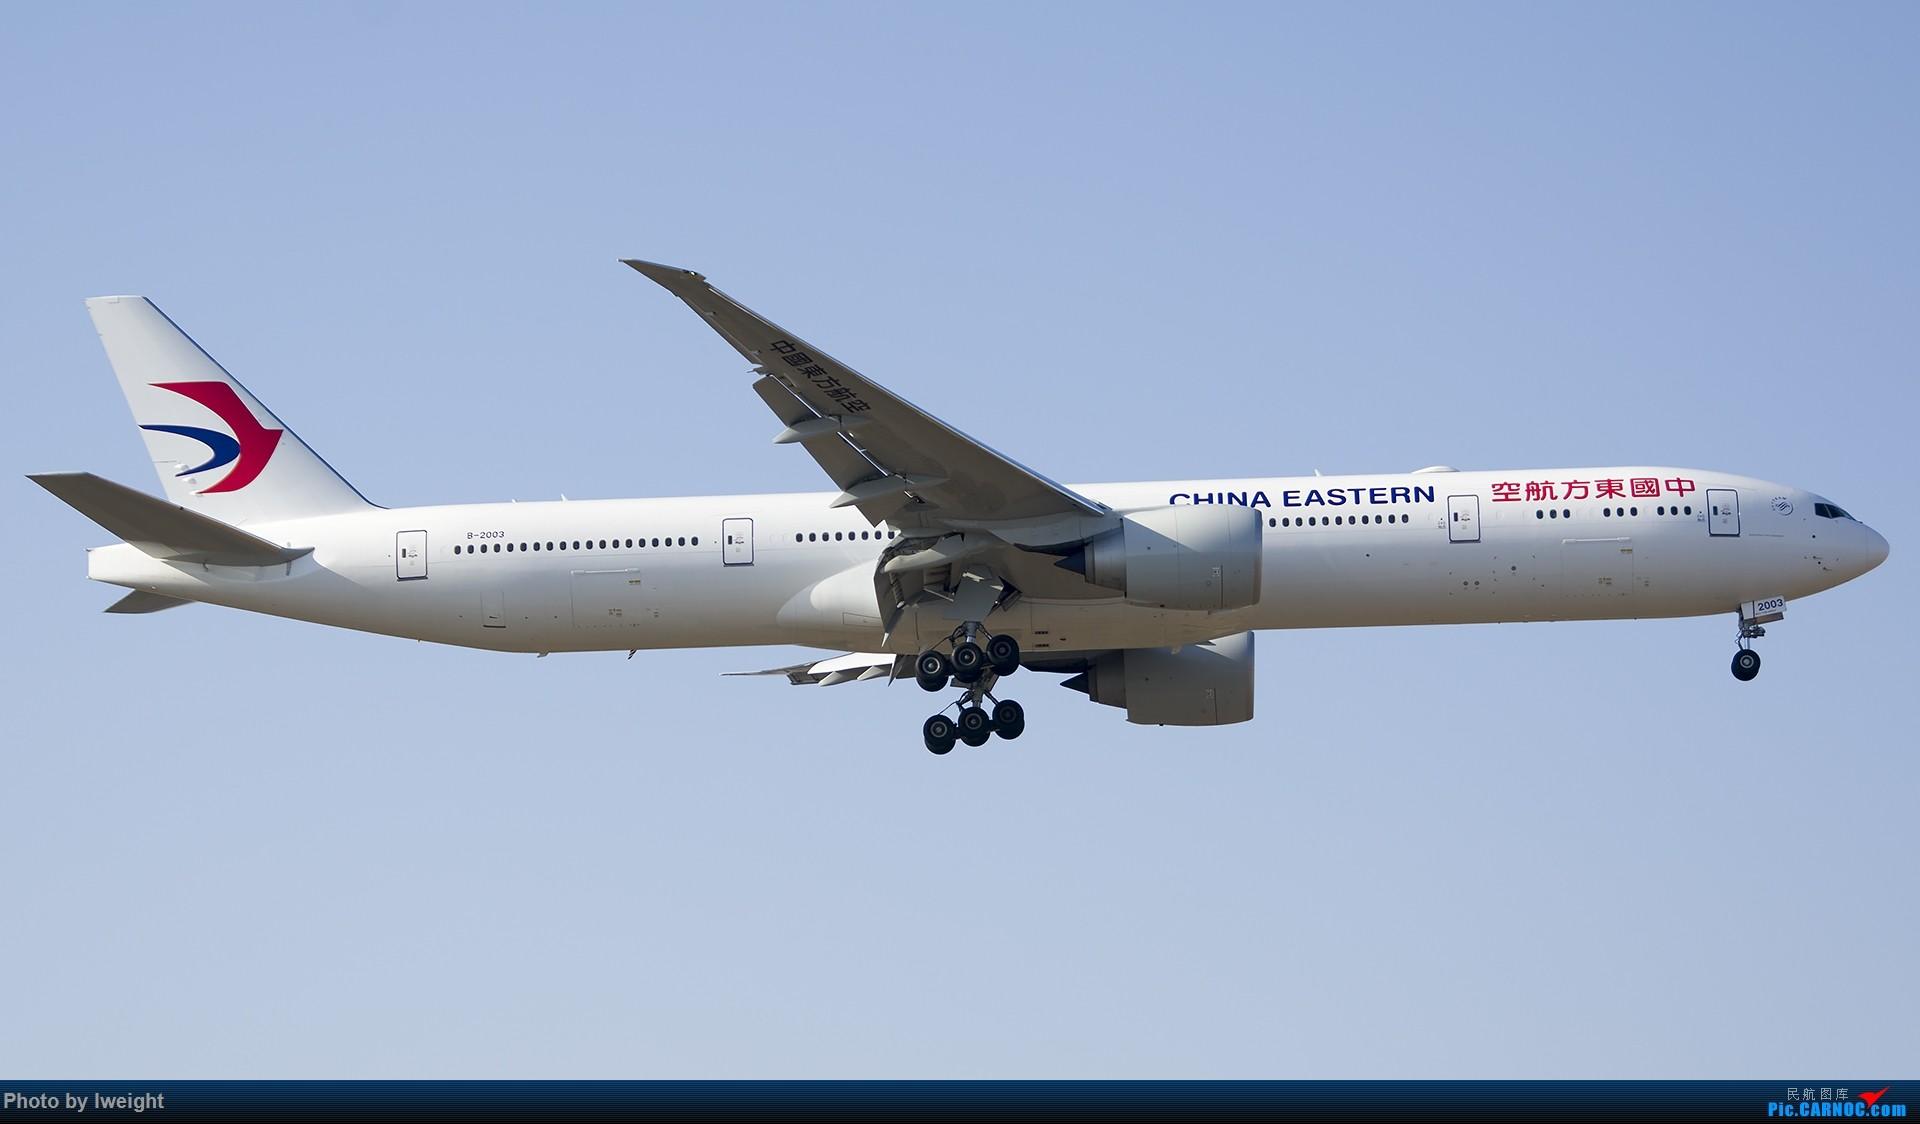 Re:[原创]庆祝升级777,发上今天在首都机场拍的所有飞机【2014-12-14】 BOEING 777-300ER B-2003 中国北京首都国际机场